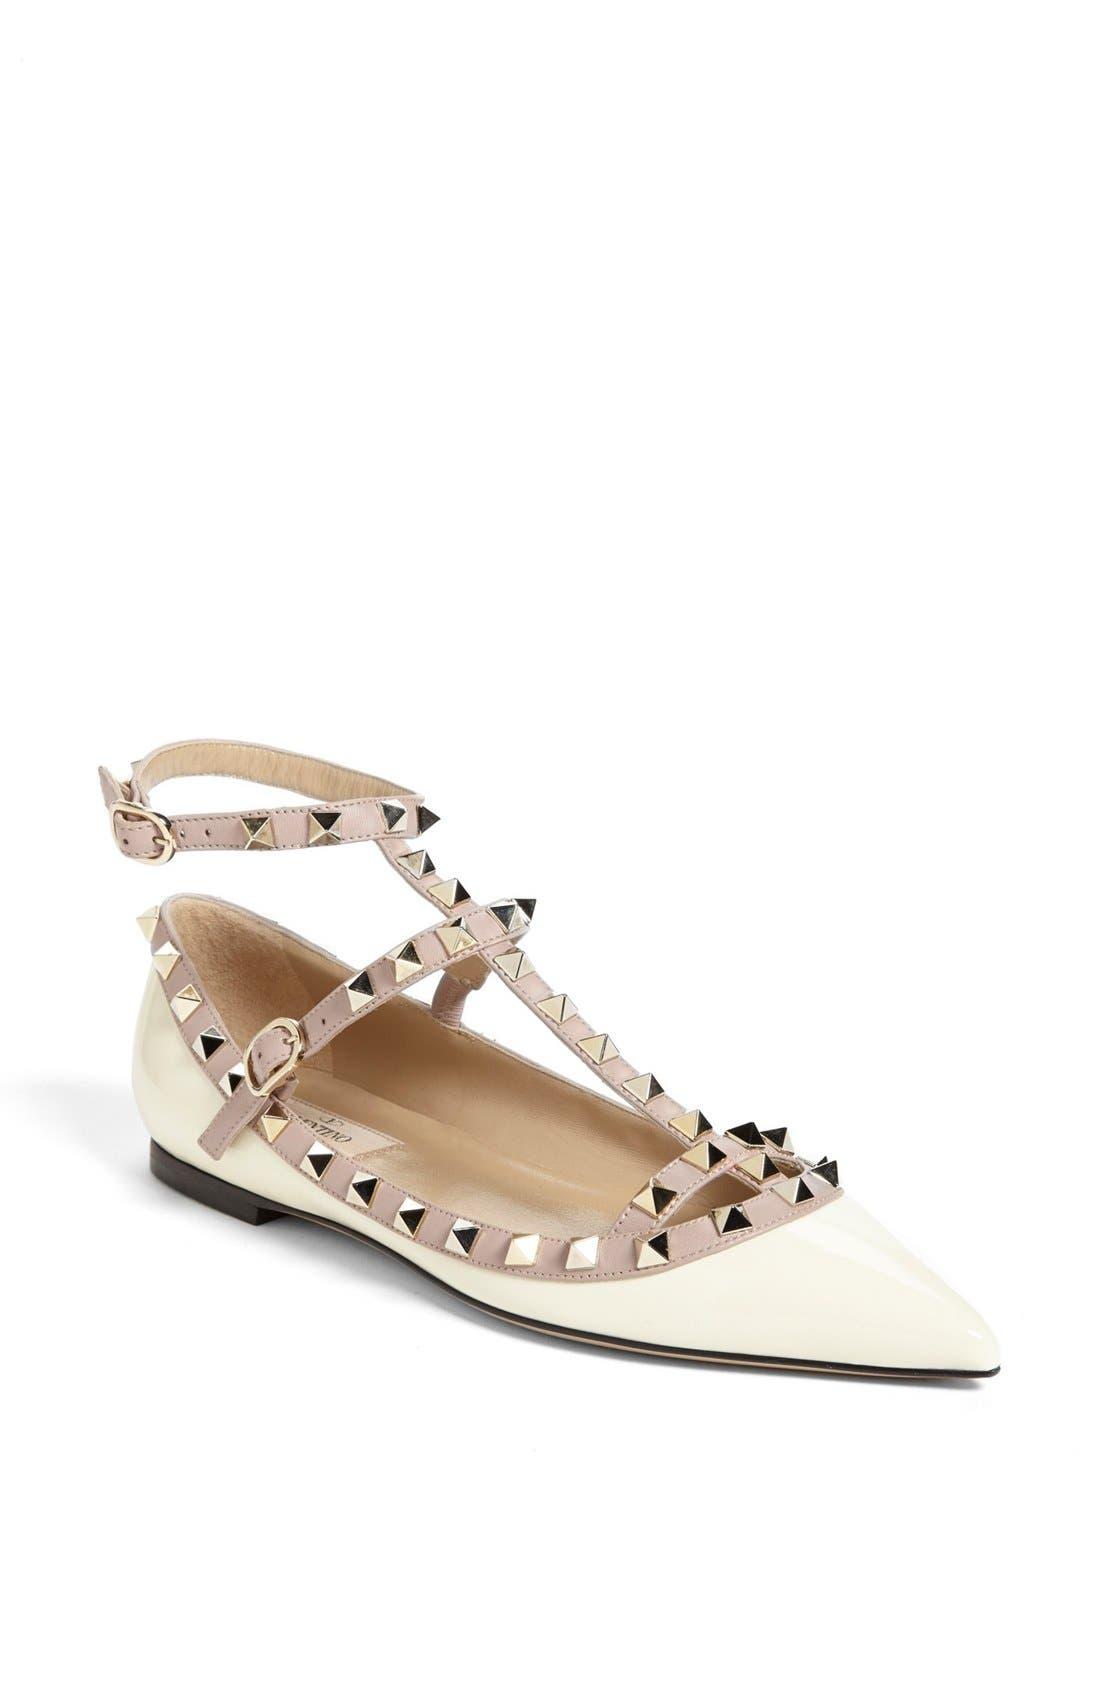 Main Image - VALENTINO GARAVANI 'Rockstud' Double Ankle Strap Ballet Flat